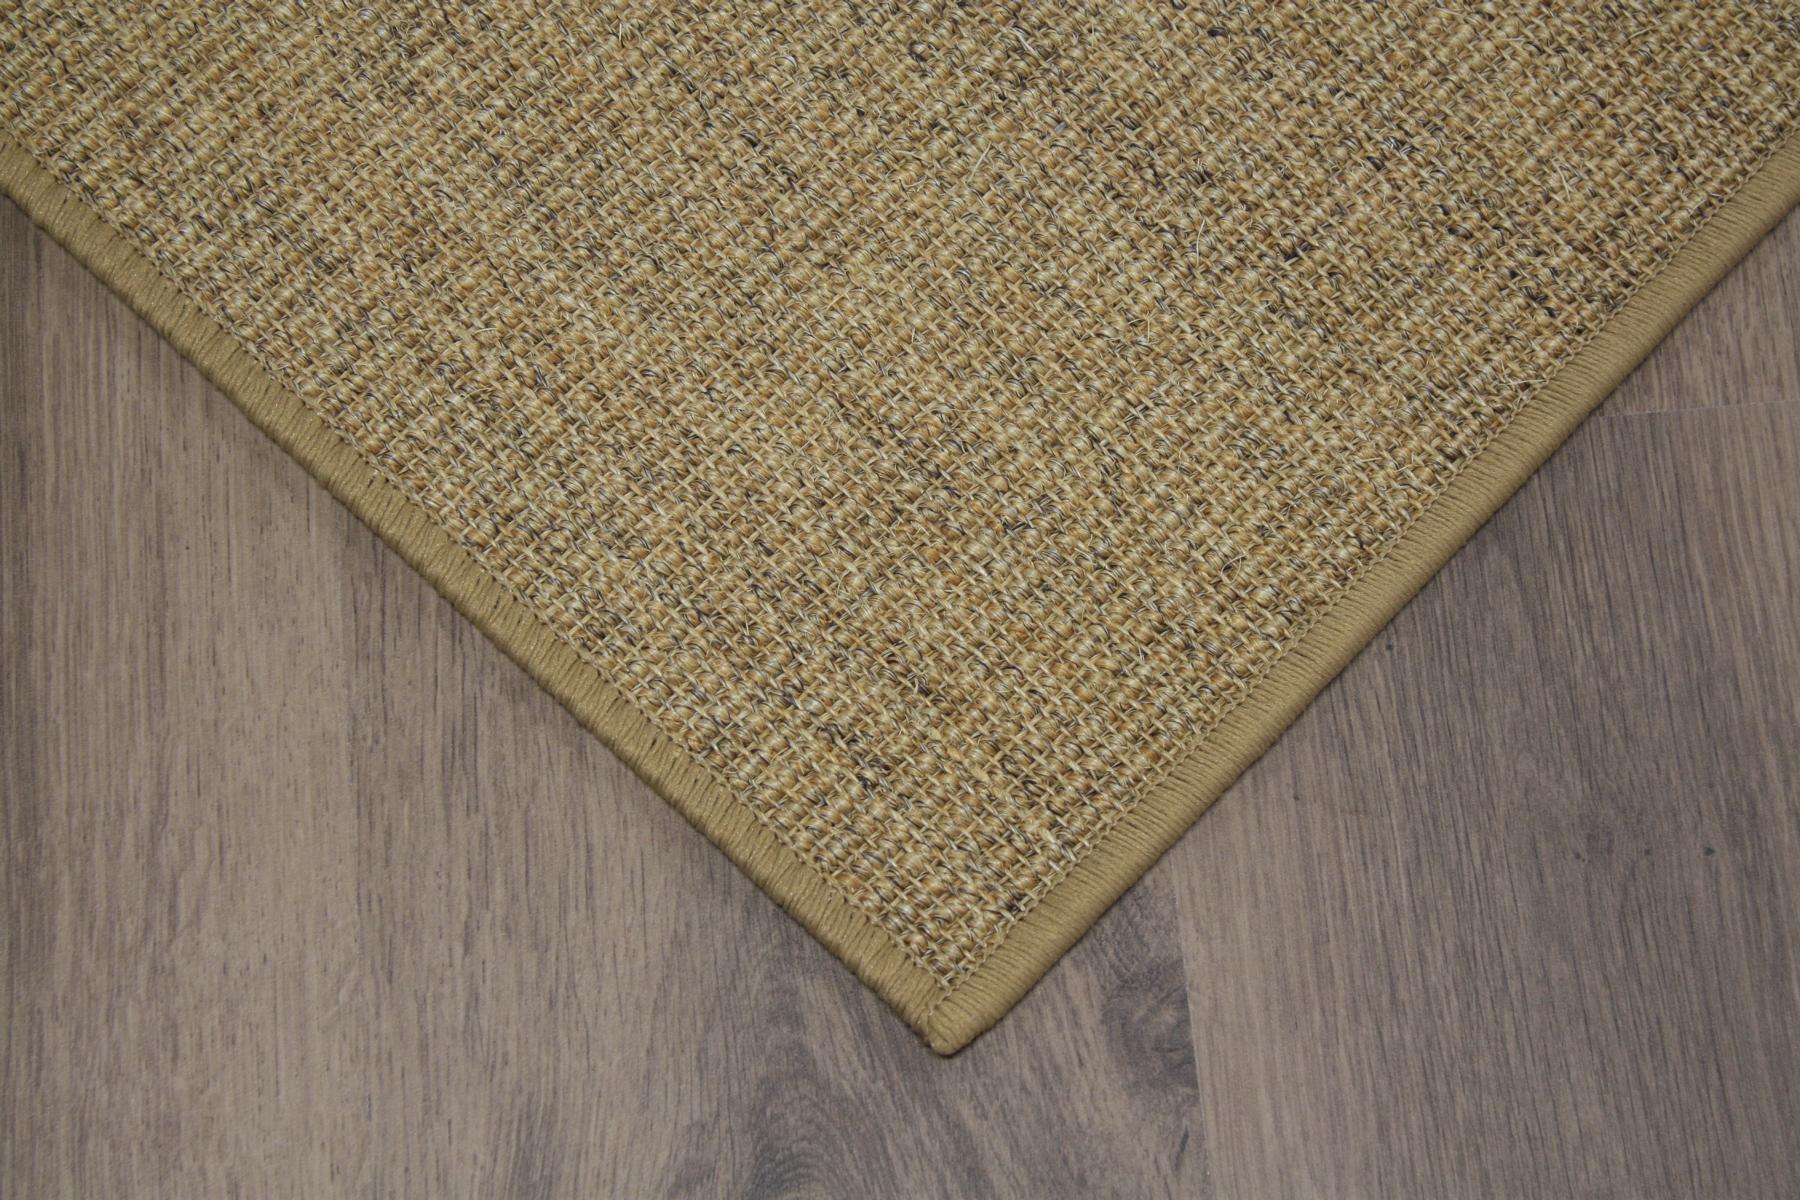 sisal teppich umkettelt jaspe 200x250cm 100 sisal gekettelt ebay